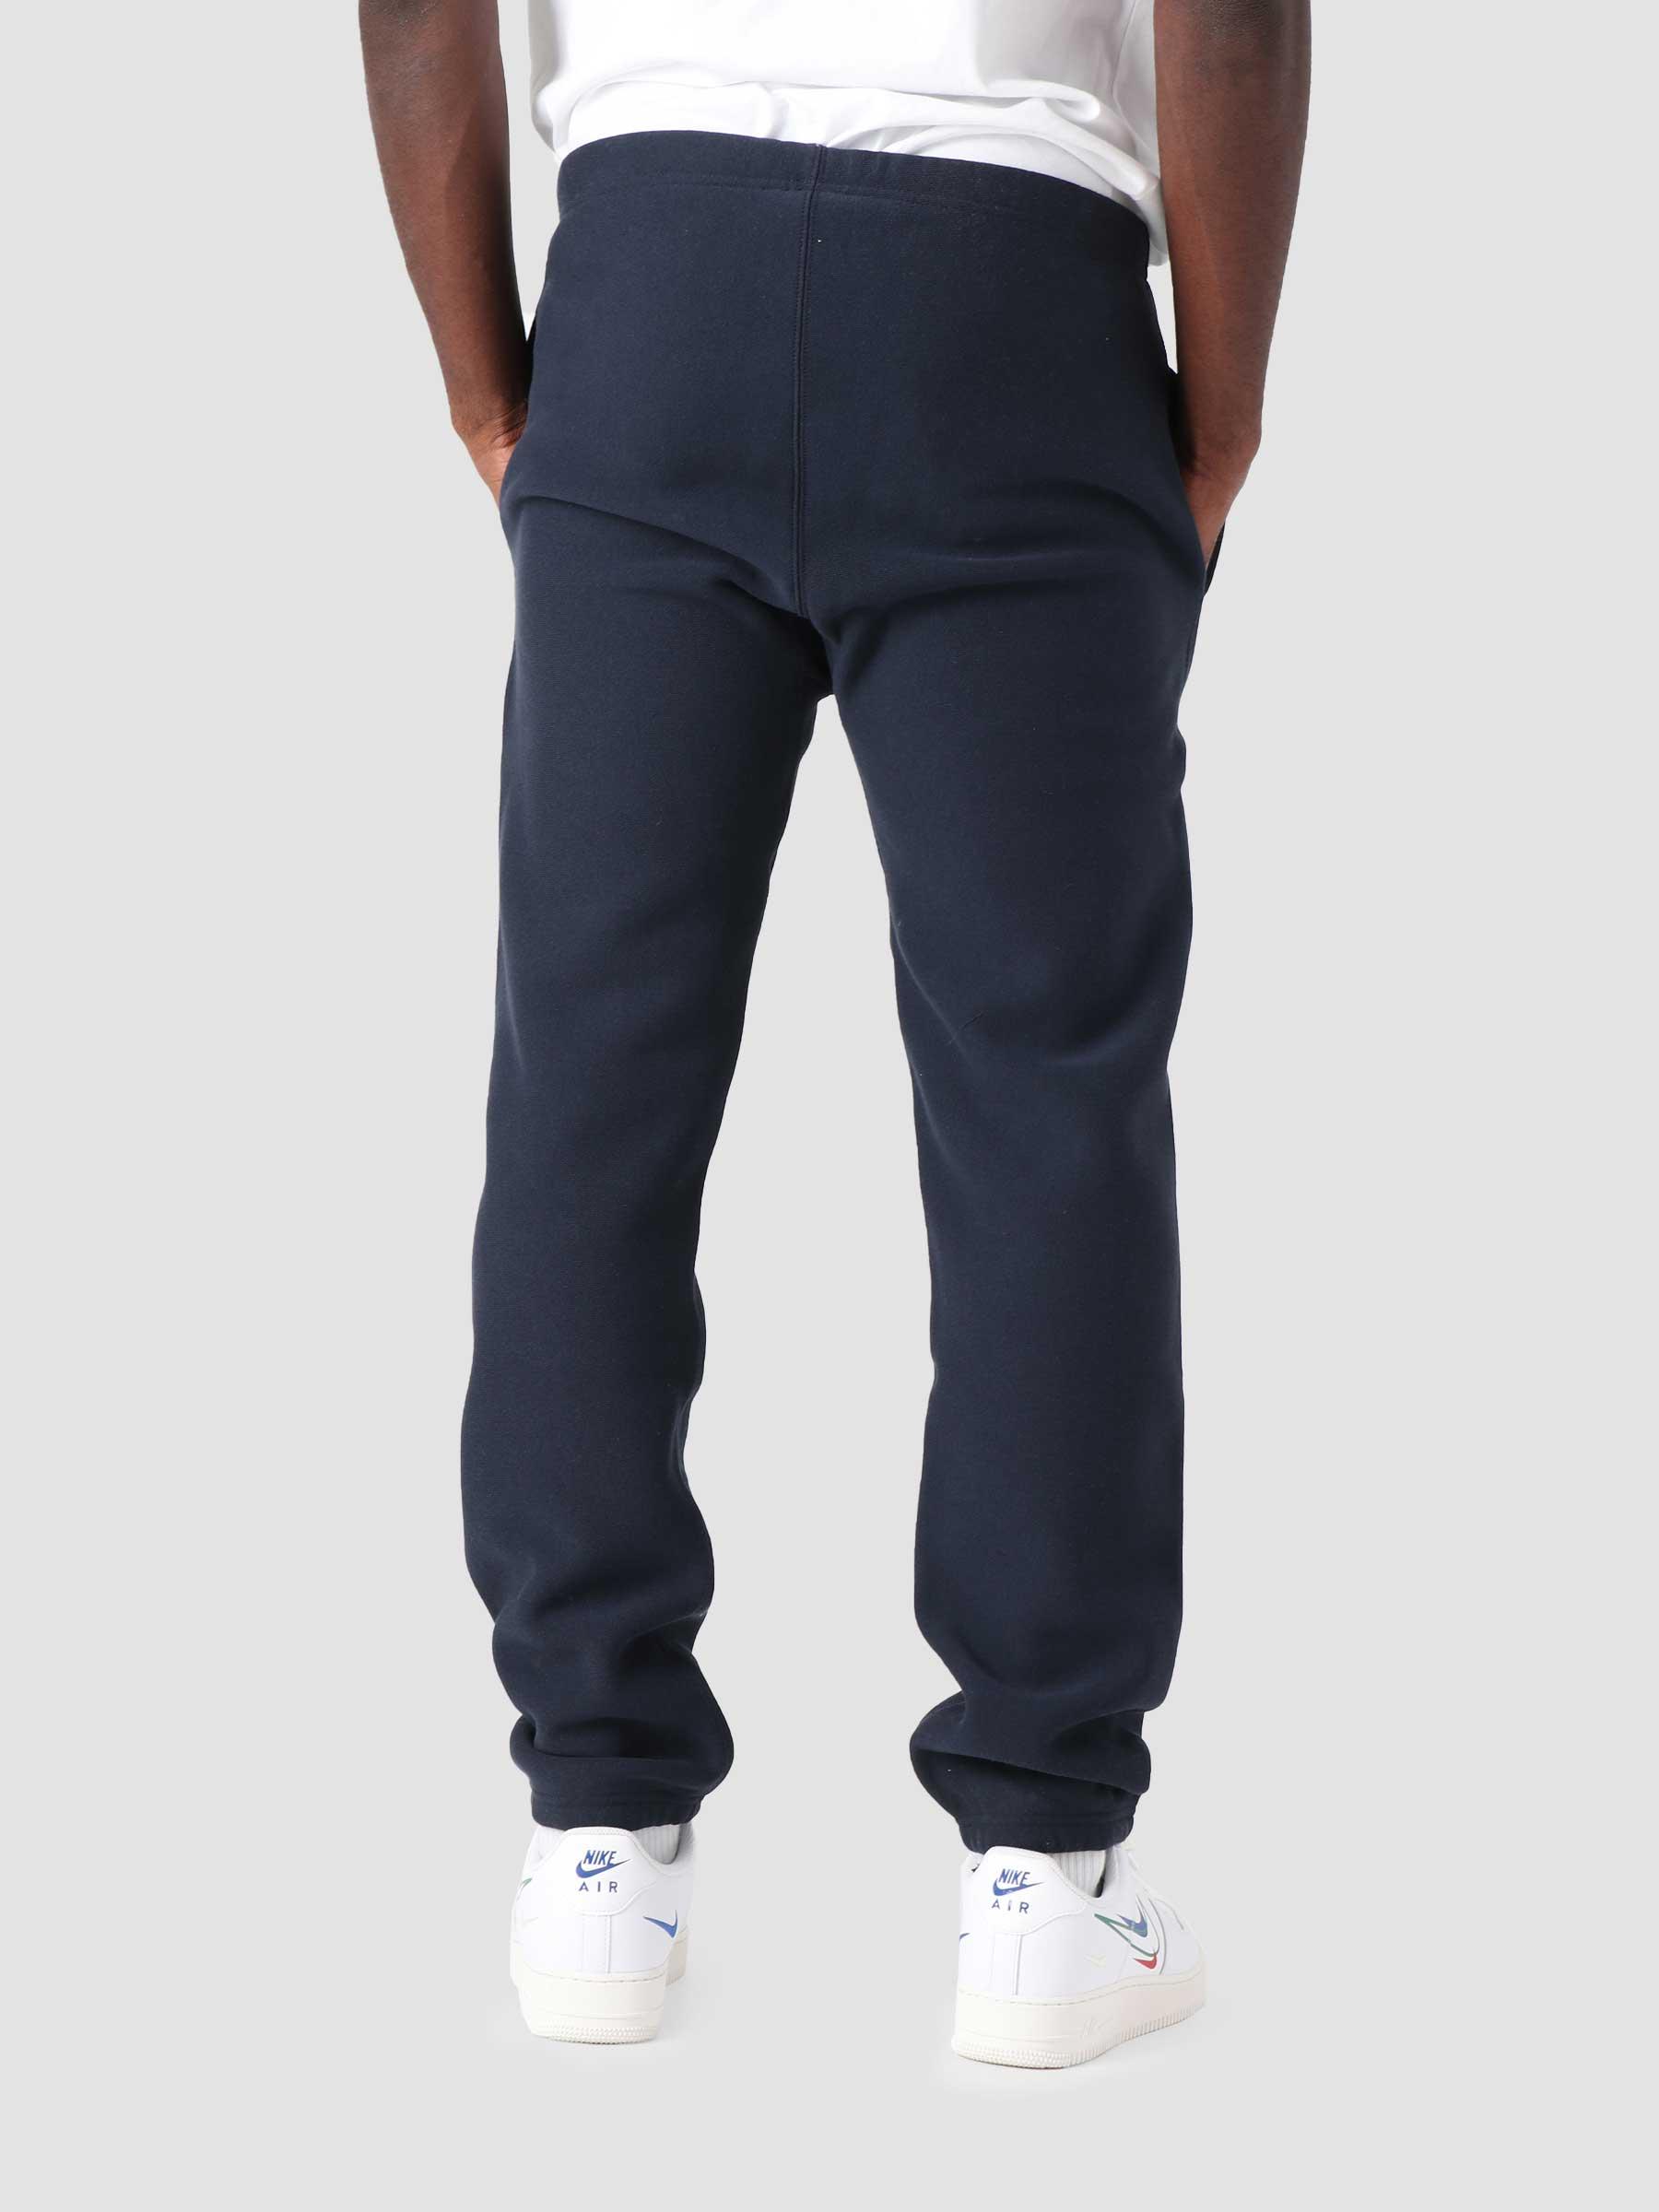 Reverse Weave Soft Fleece Elastic Cuff Pants Navy COKFQ7-BS501